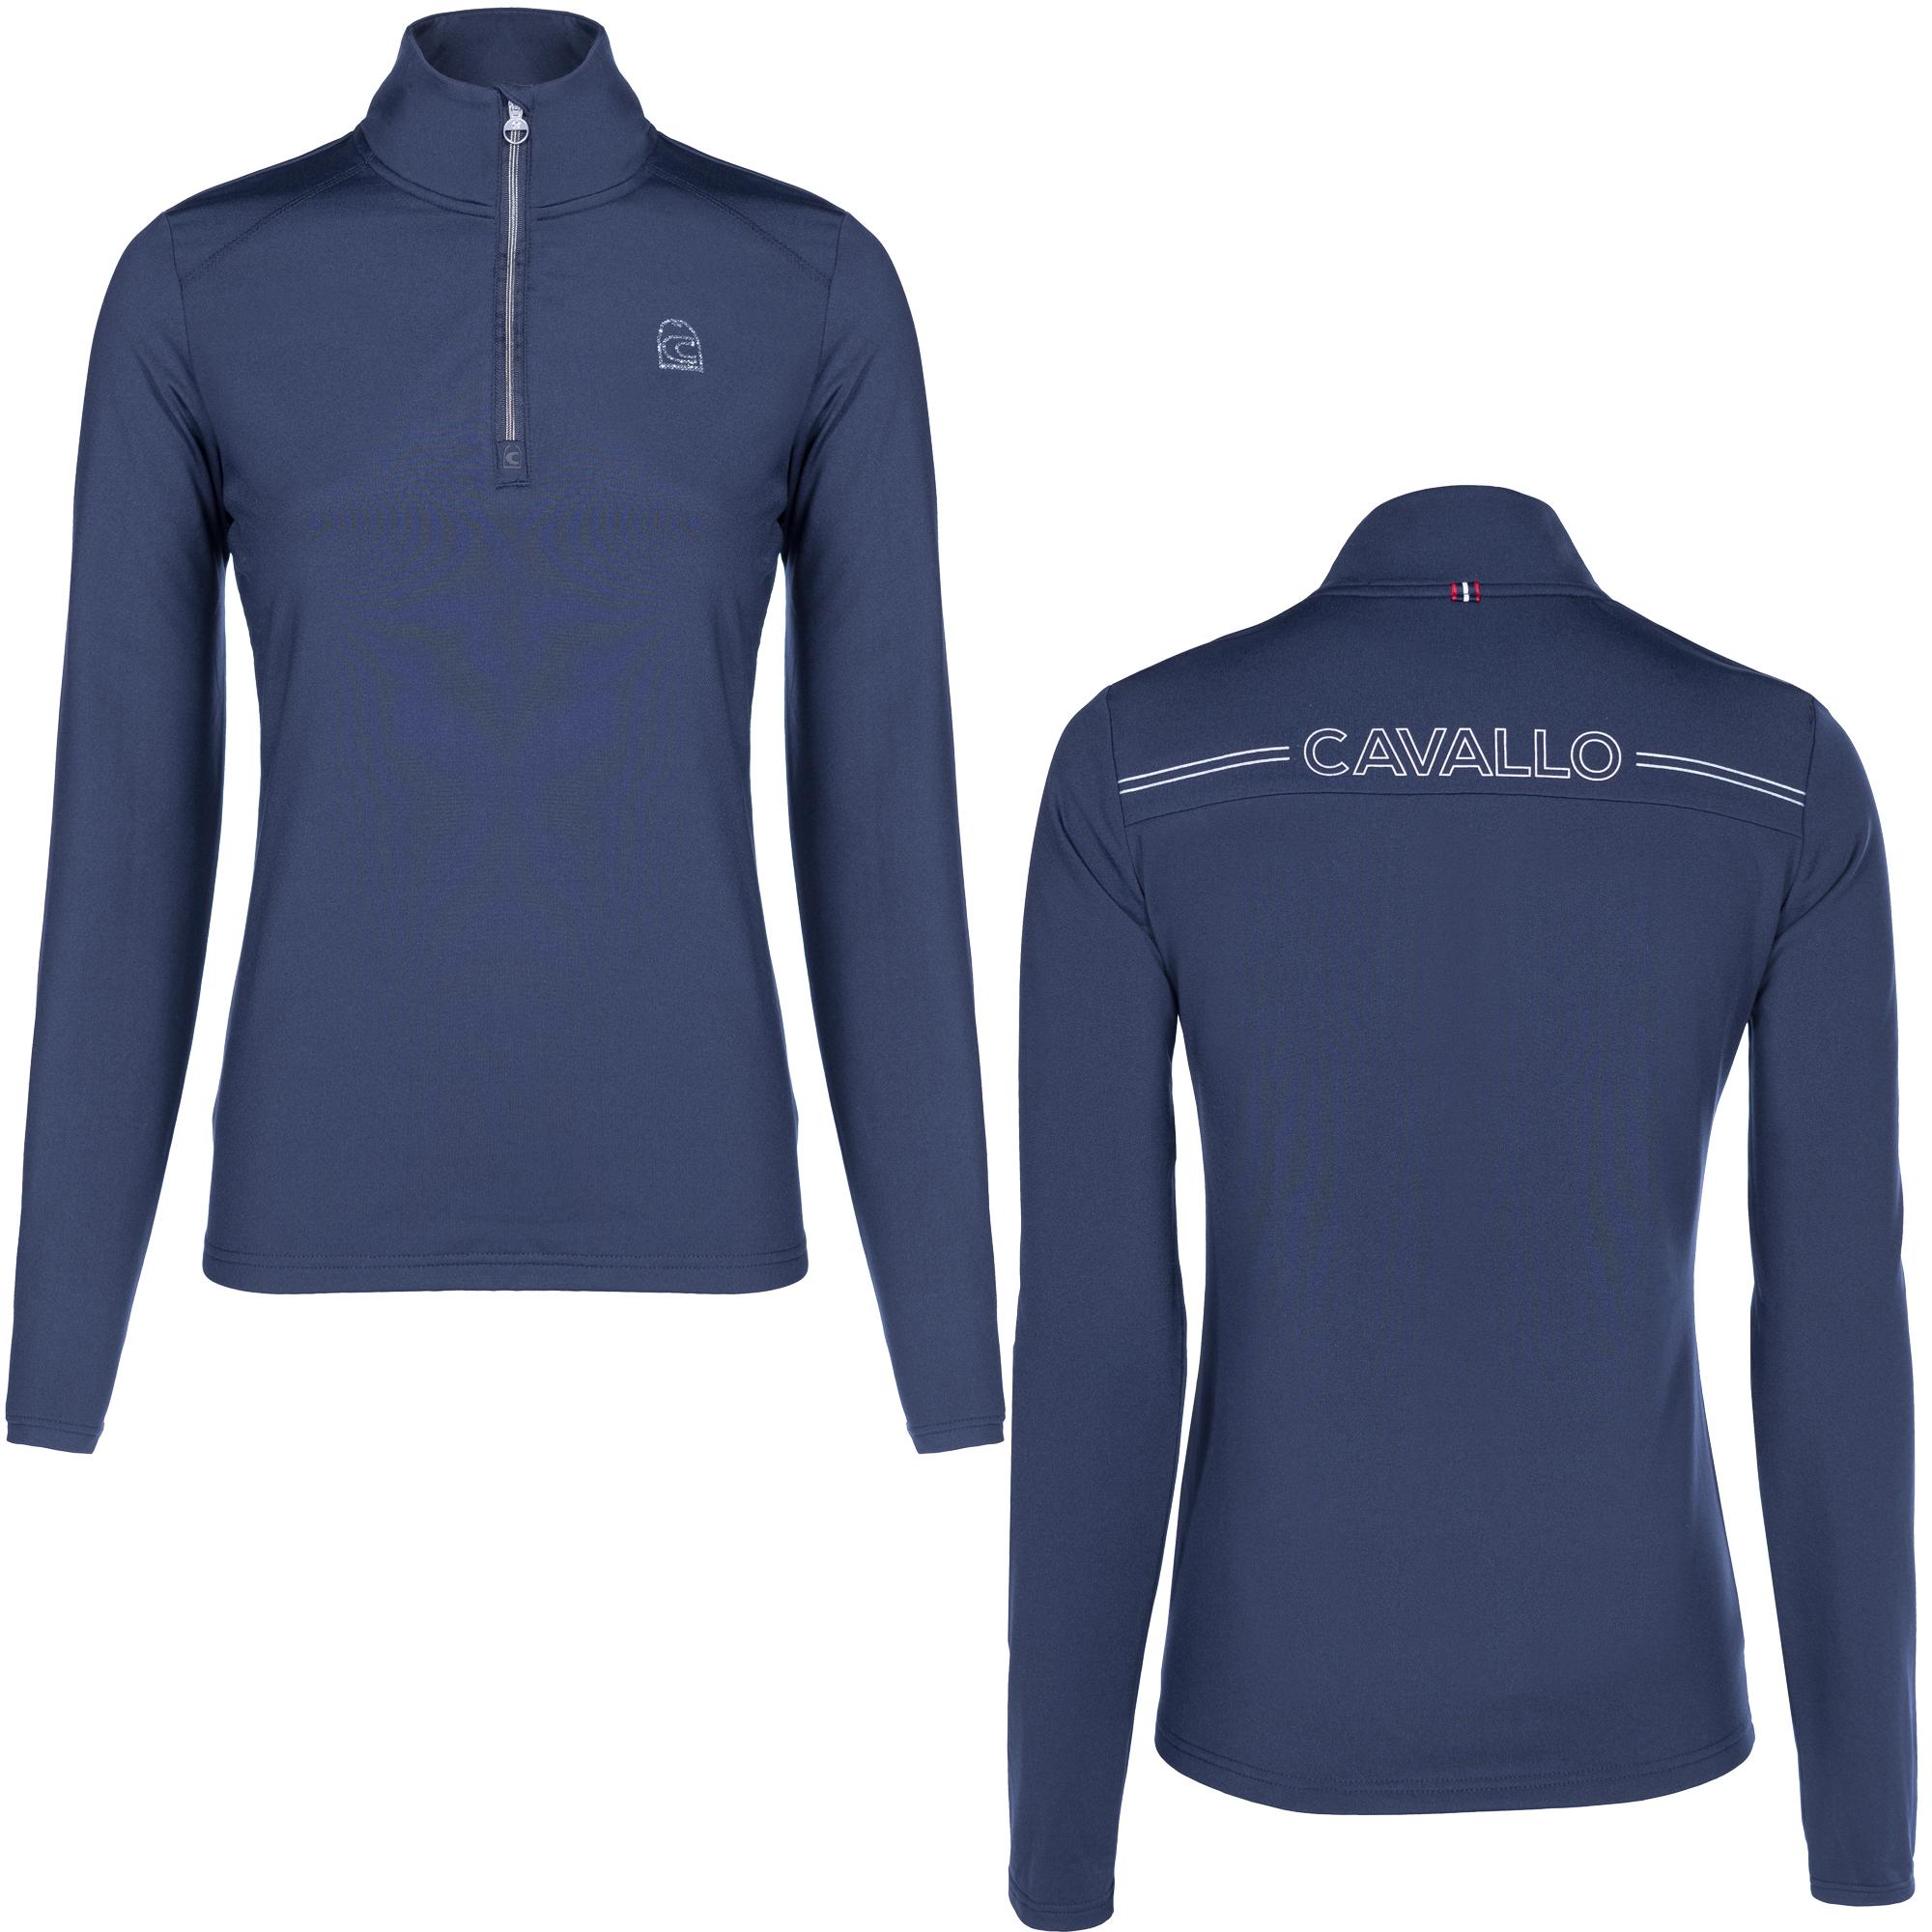 Cavallo Damen Funktions -Shirt BAIKY in darkblue